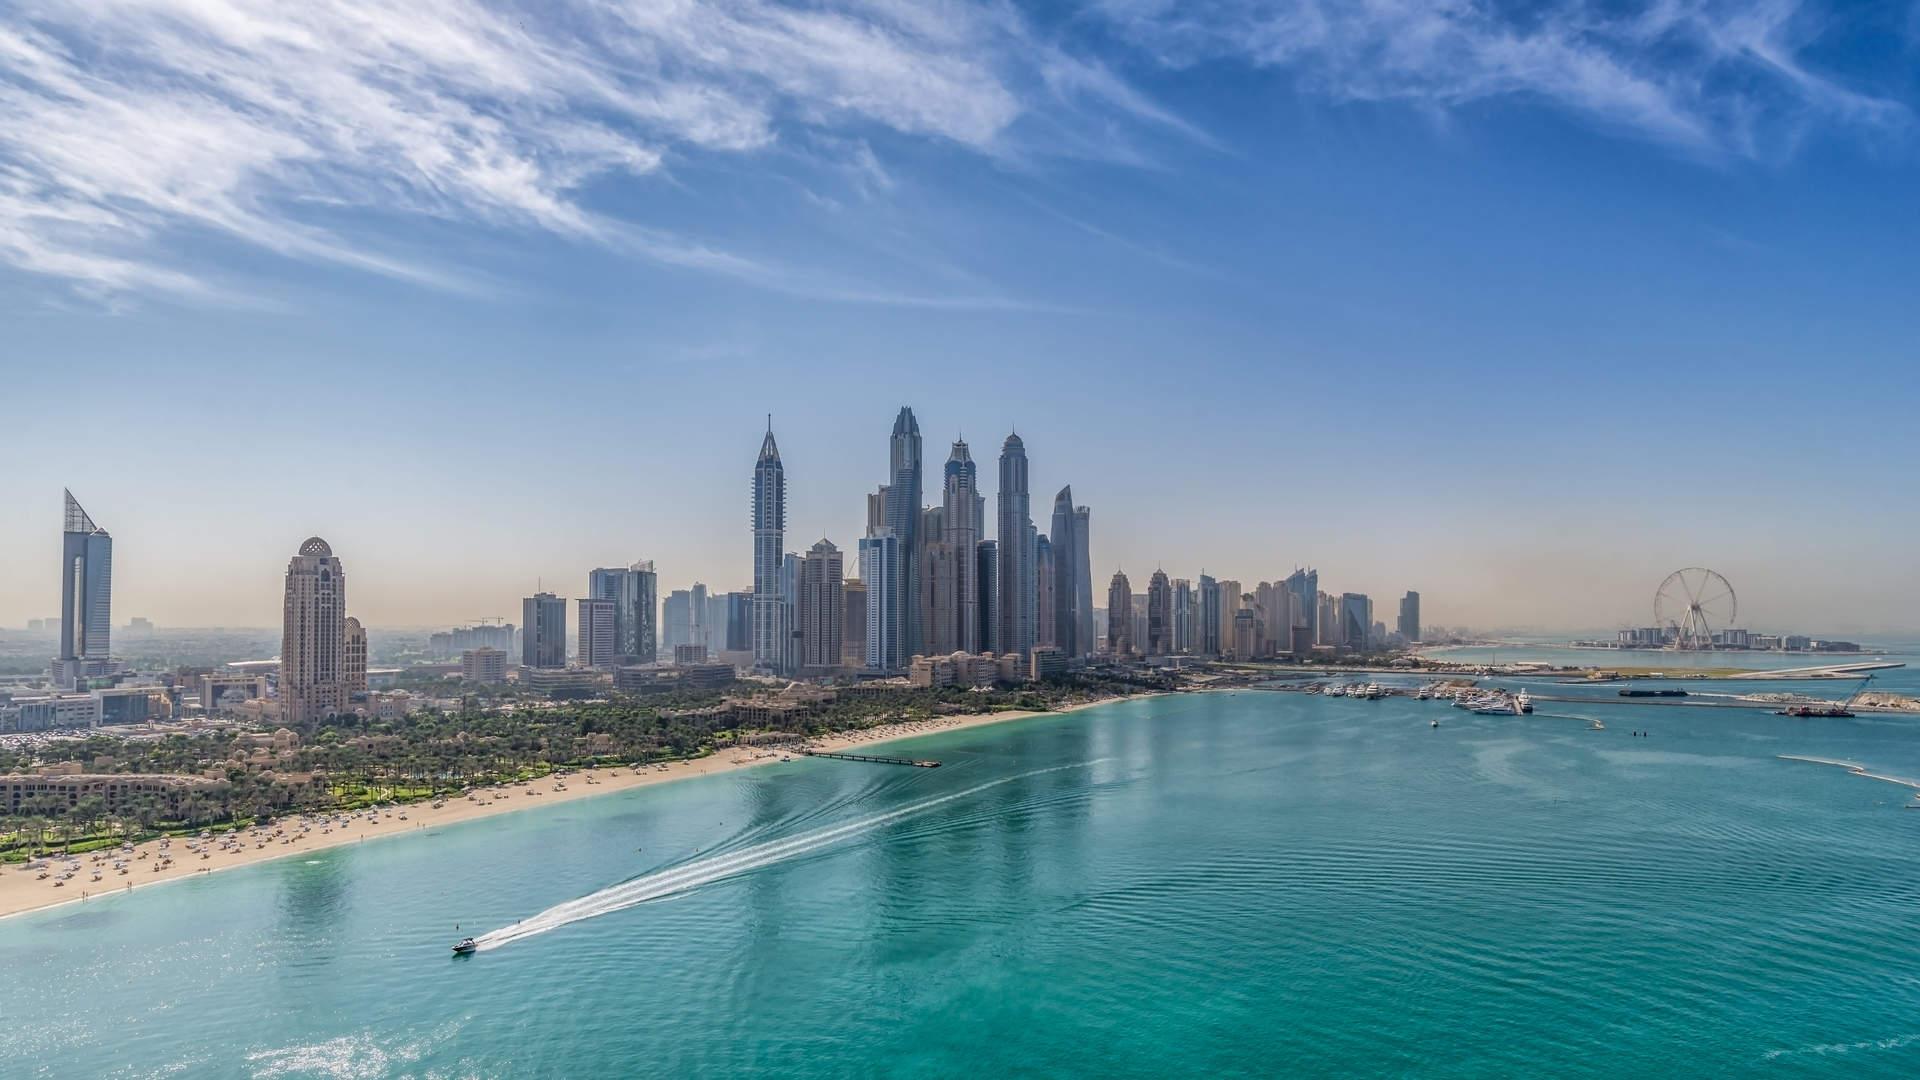 Dubai Marina Waterfront View